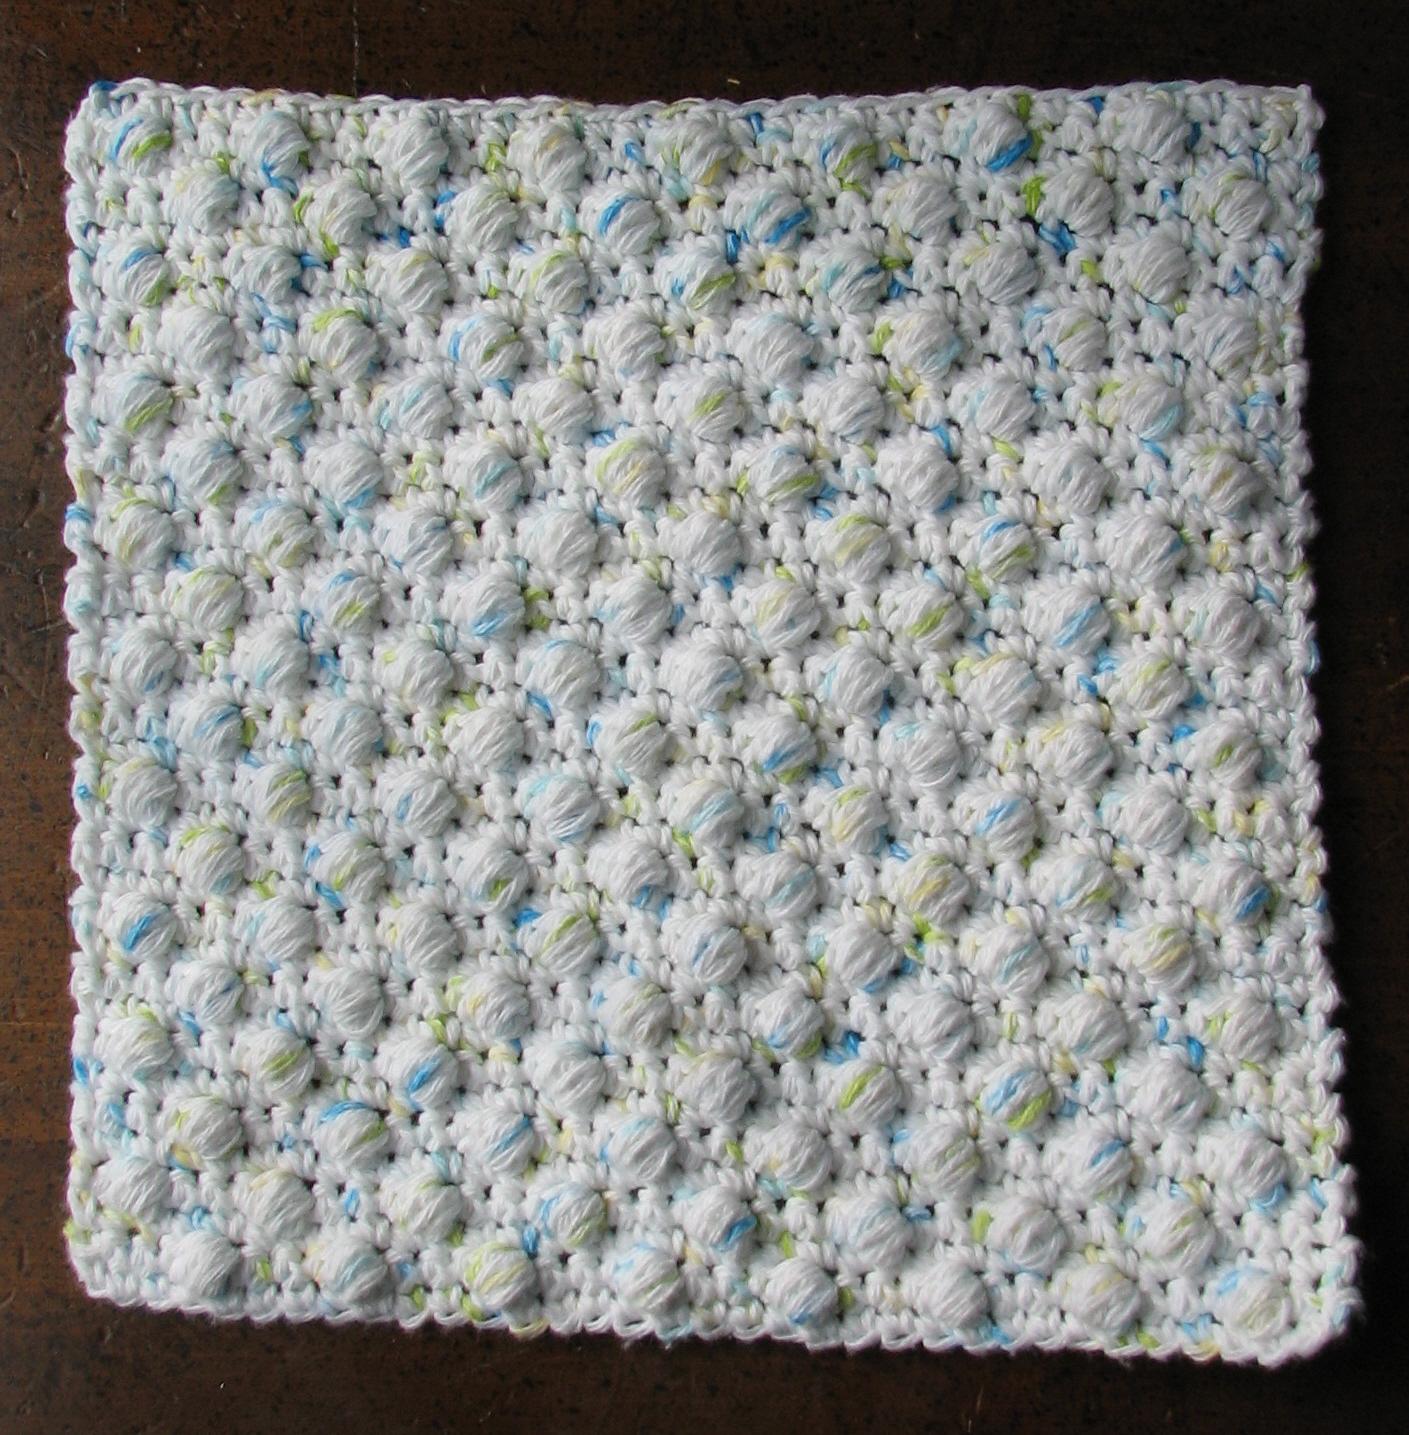 Washcloth tawashi dishcloth patterns roundup ambassador crochet crochet dishcloth patterns free ball stitch pattern by ambassador crochet bankloansurffo Gallery